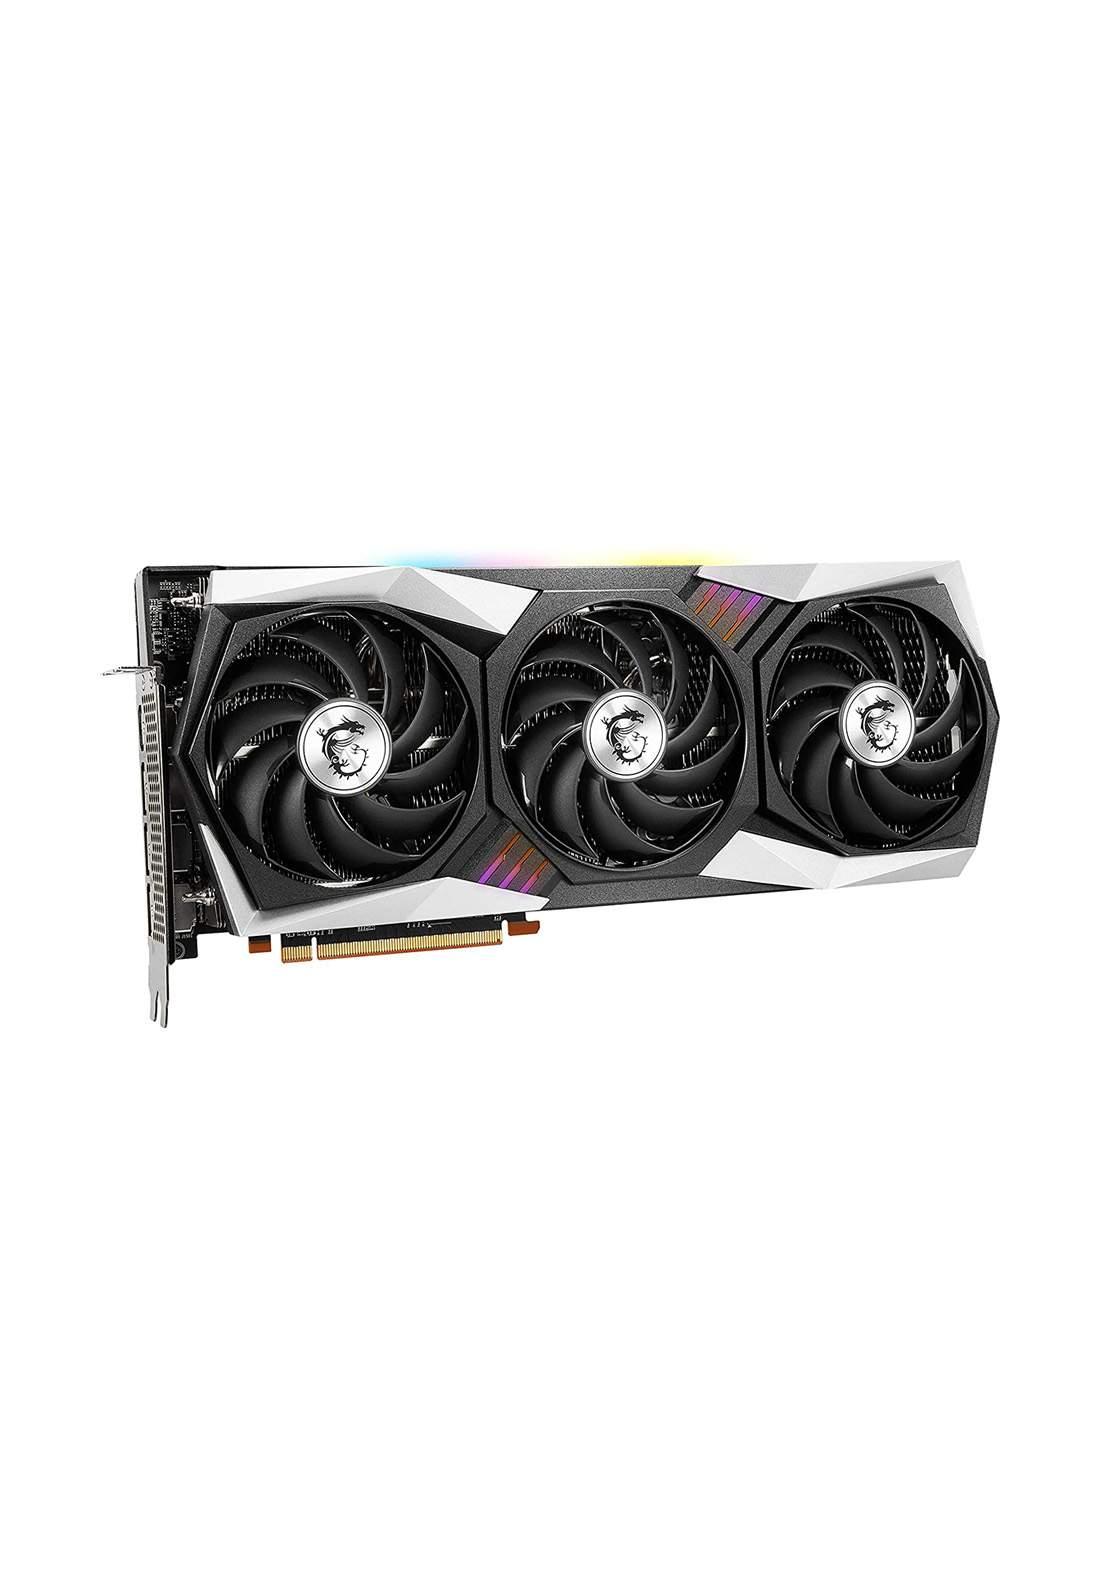 MSI Radeon RX6900 XT GAMING X TRIO Graphics Card - Black